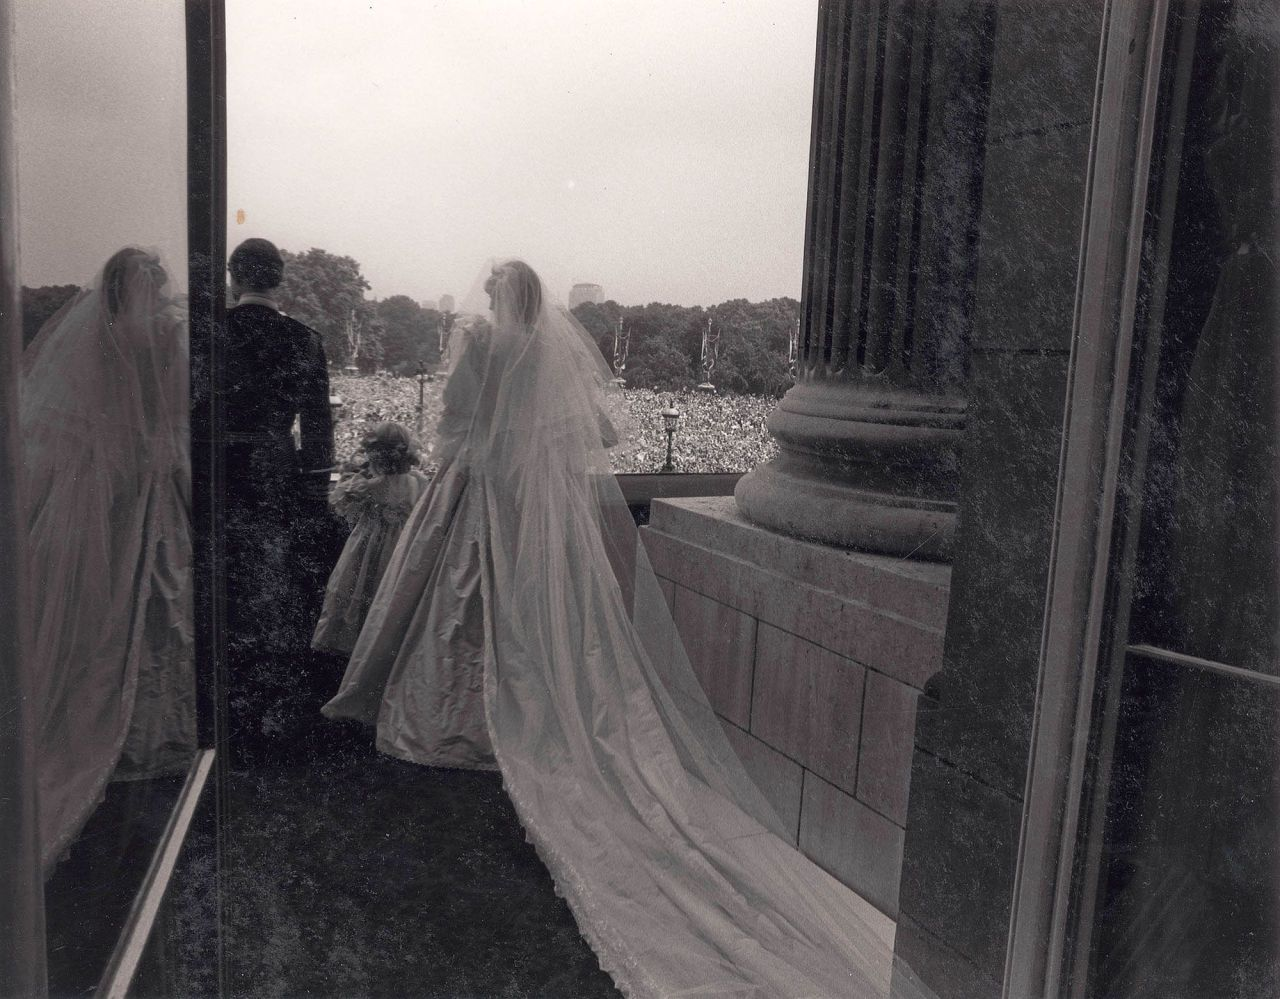 NeverBeforeSeen Photos From Princess Diana's Wedding